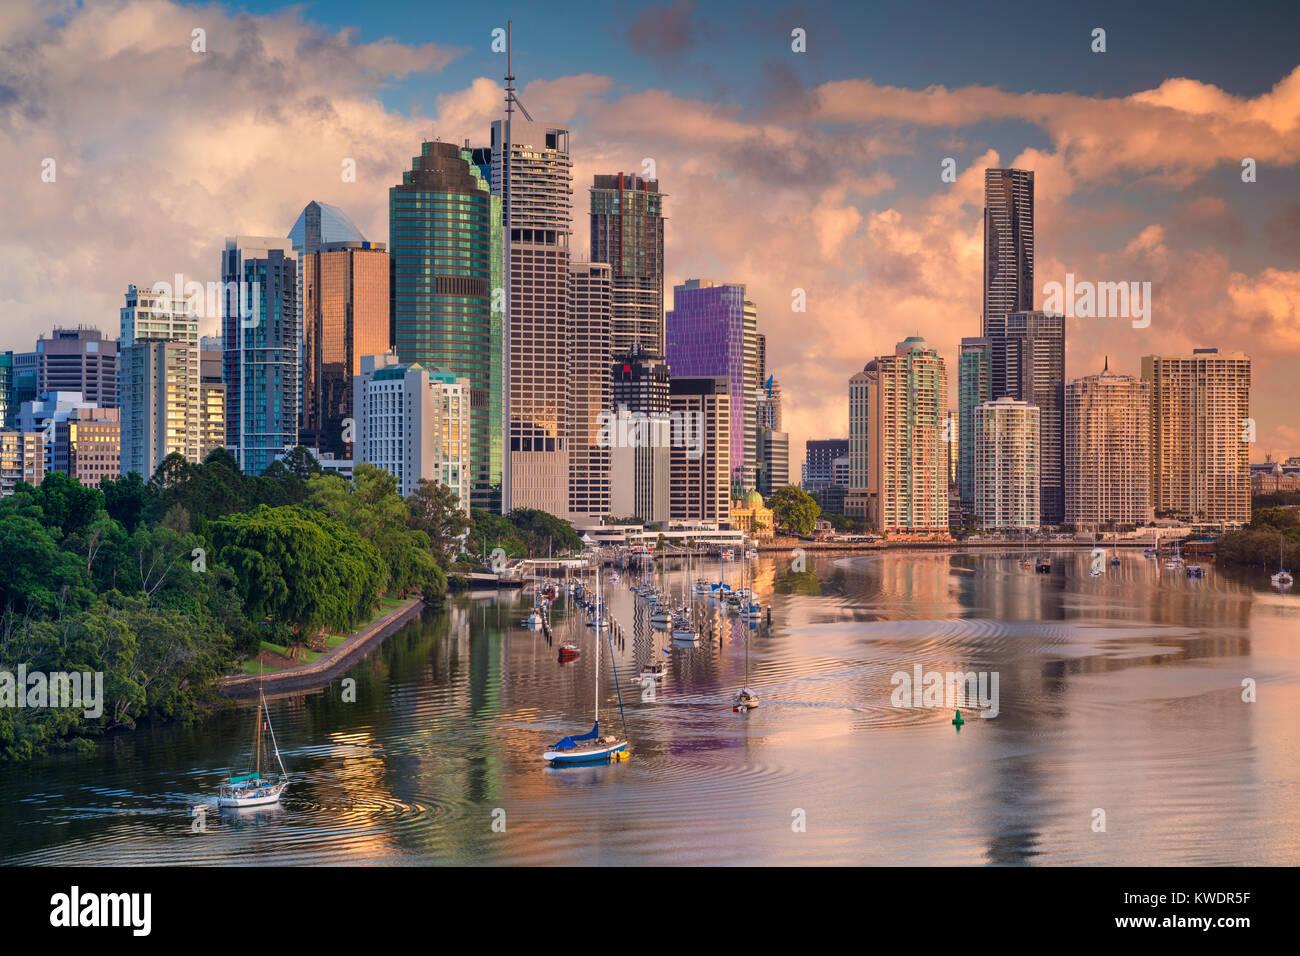 Brisbane. Paisaje urbano imagen de skyline de Brisbane, Australia durante el amanecer. Imagen De Stock